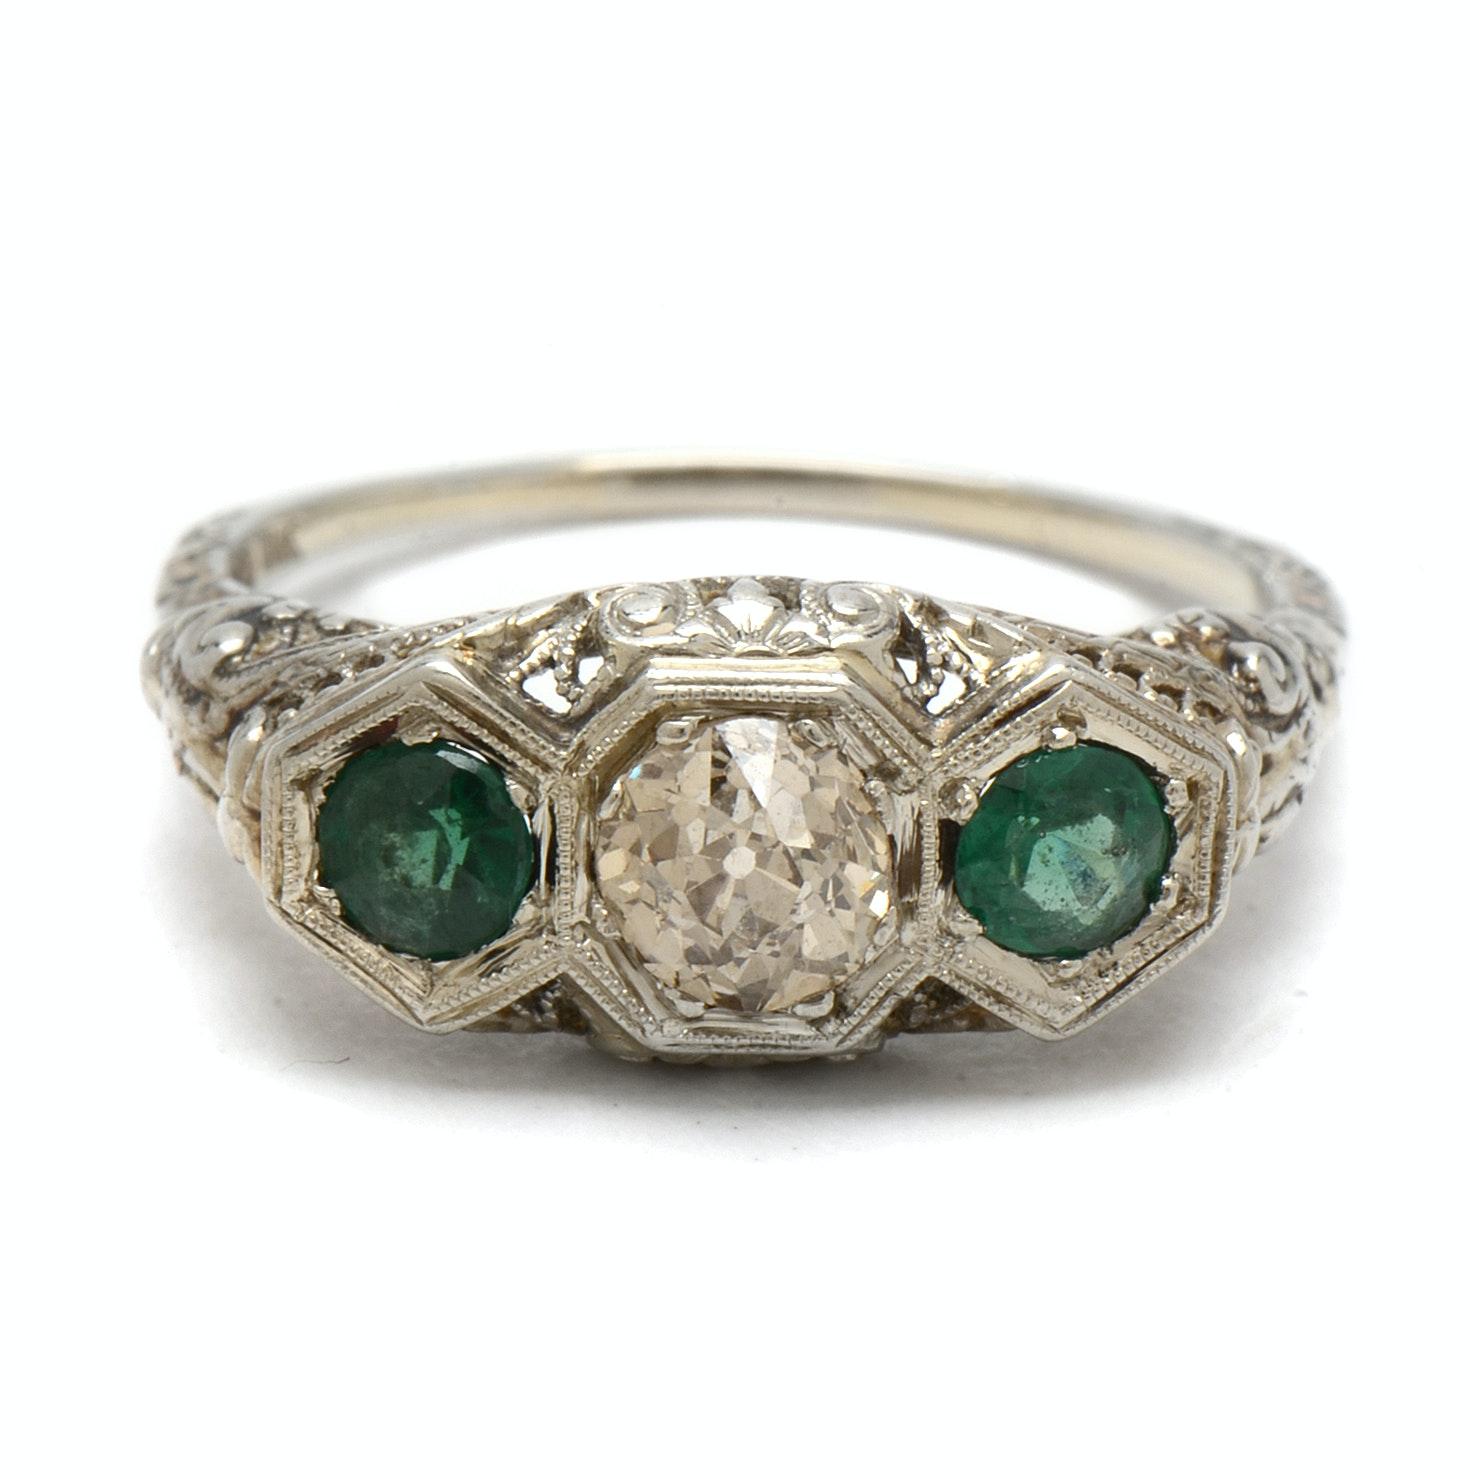 Late Edwardian 18K White Gold Diamond and Green Garnet Doublet Filigree Ring